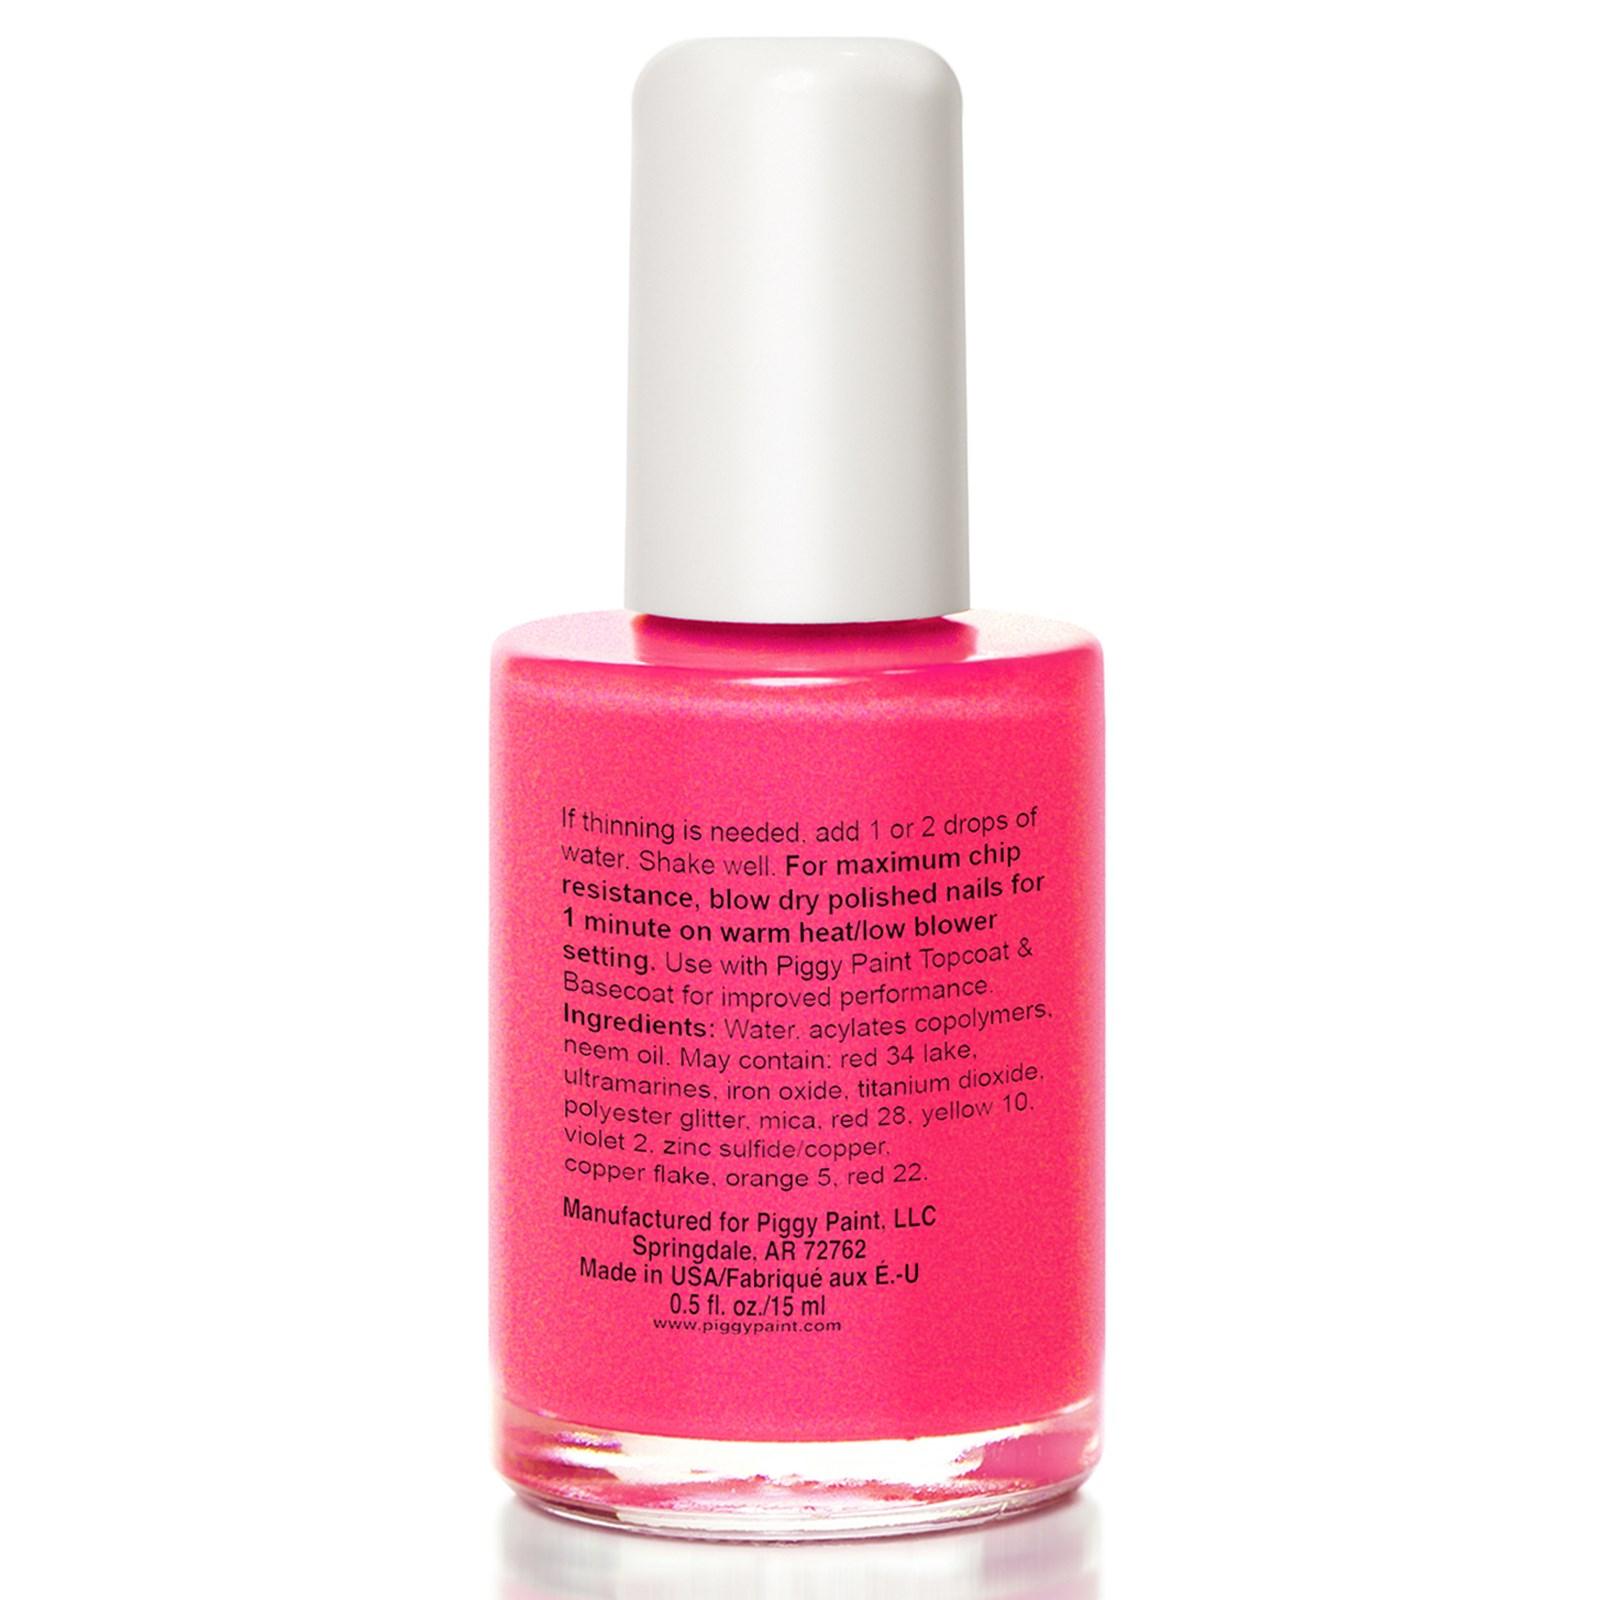 Piggy Paint, Nail Polish, Forever Fancy, 0.5 fl oz (15 ml) - iHerb.com